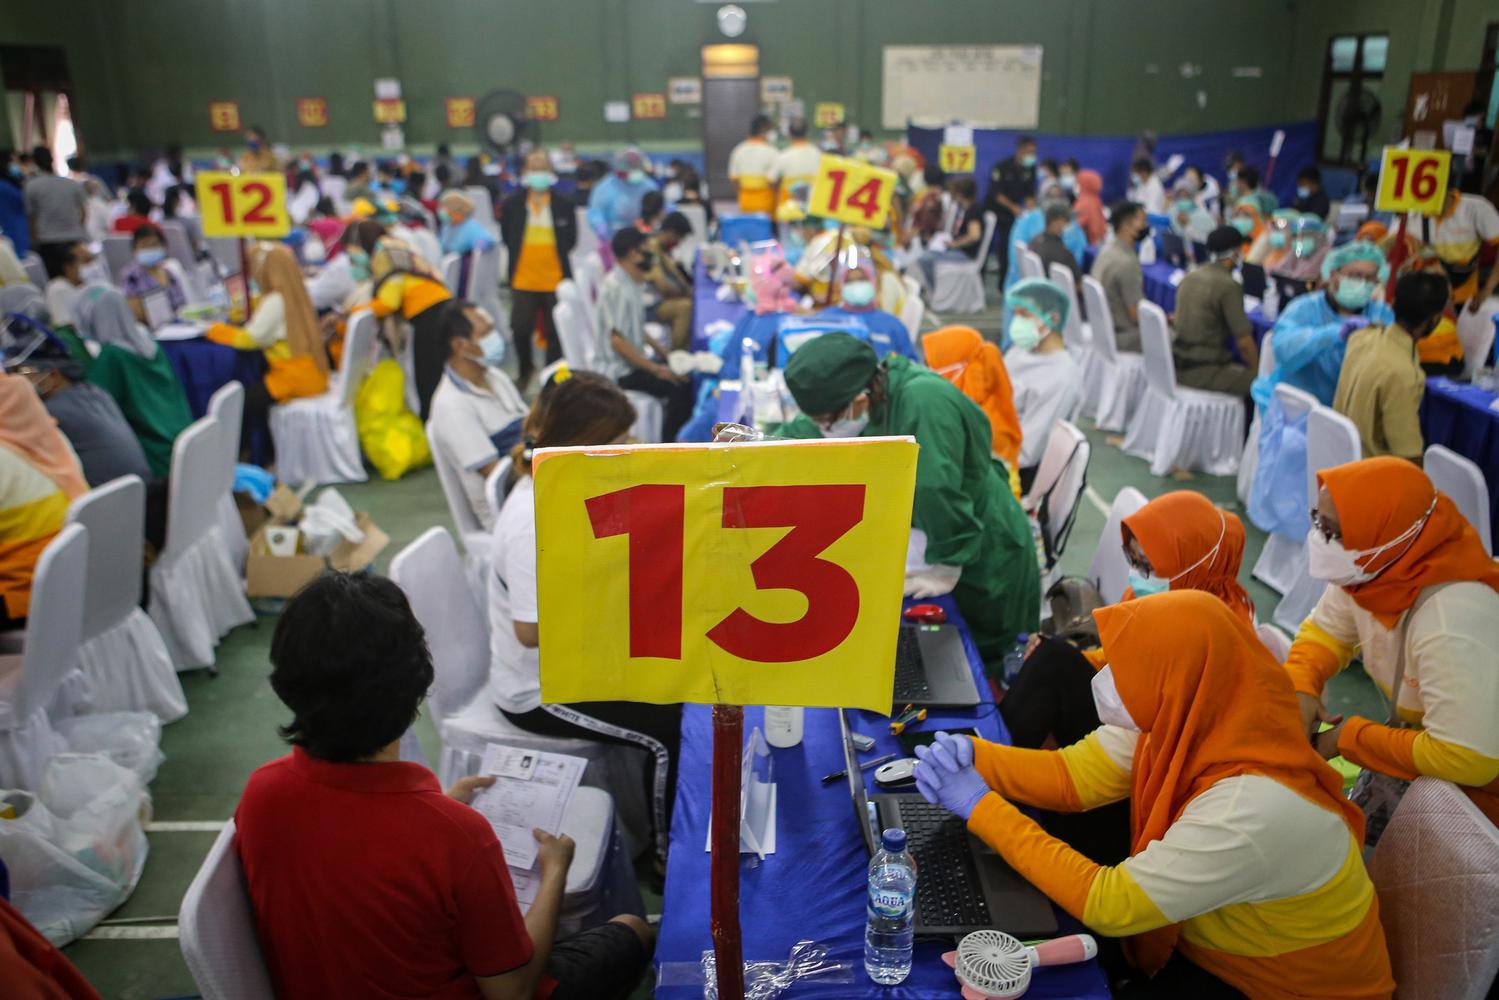 Sejumlah pedagang pasar menerima suntikan vaksin COVID-19 Sinovac di Pasar Anyar, Kota Tangerang, Banten, Senin (1/3/2021). Sebanyak 2.100 pedagang pasar di Kota Tangerang mendapat vaksinasi COVID-19 dosis pertama.